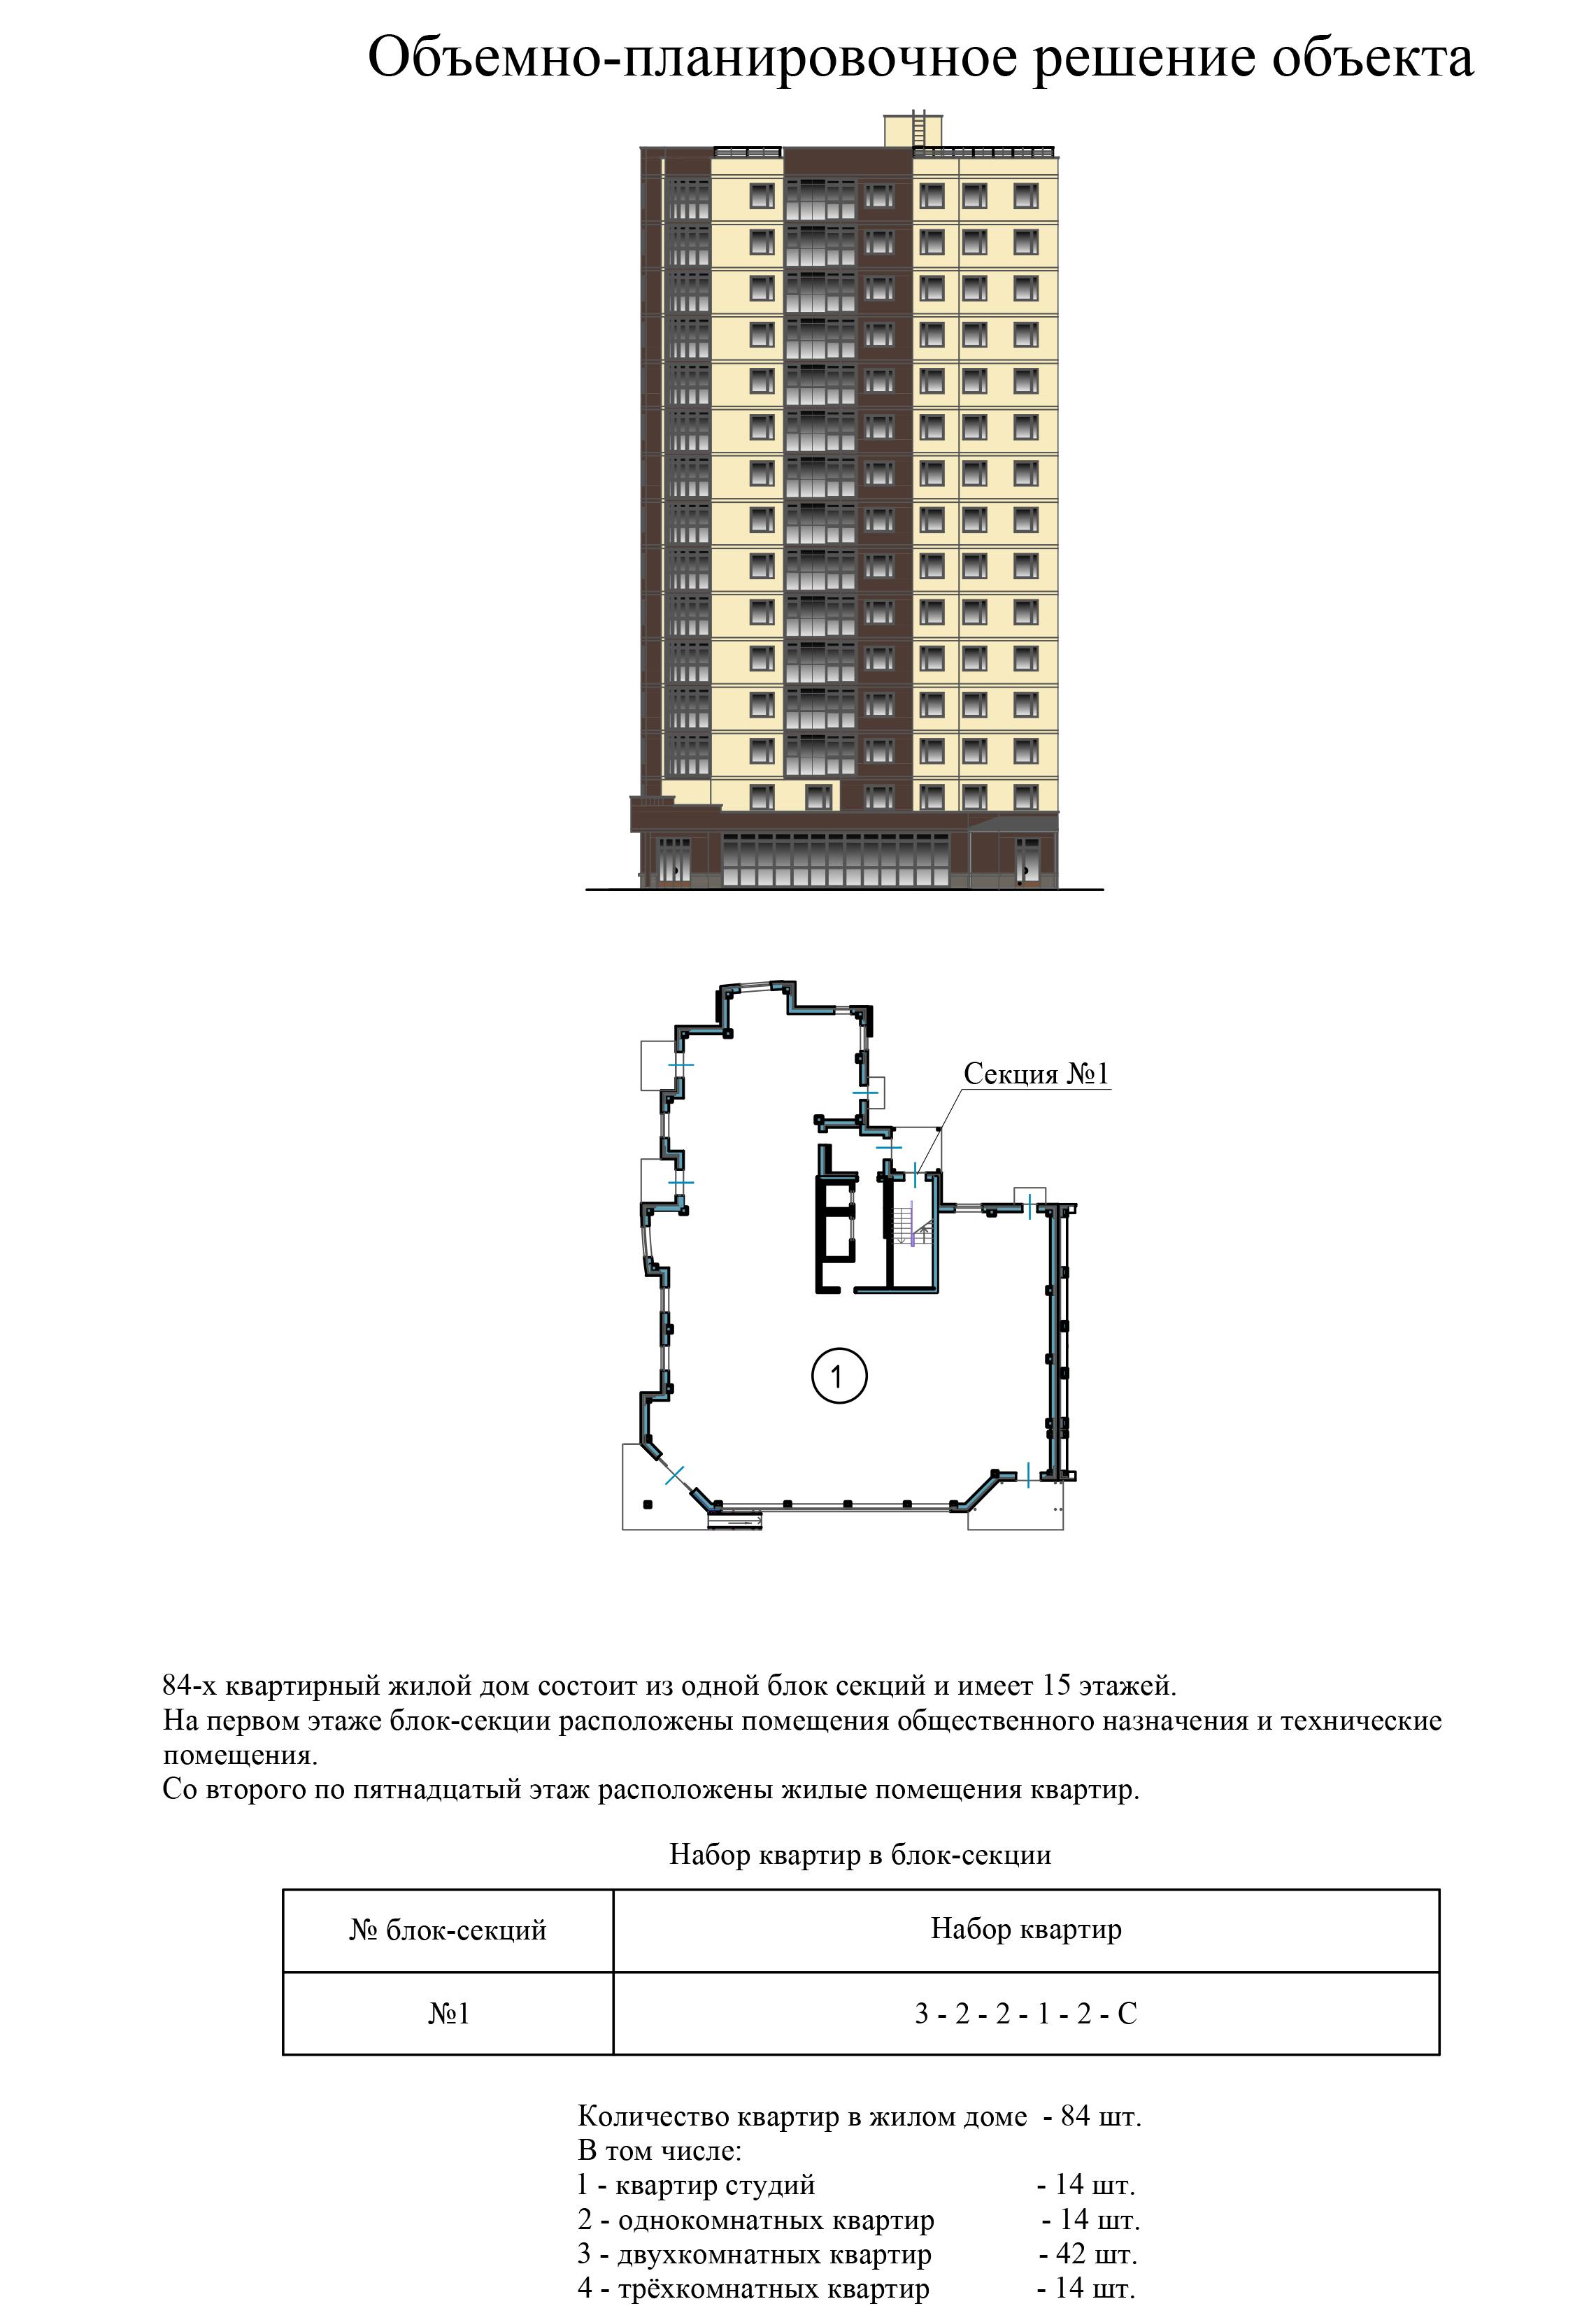 Двухкомнатная квартира - ул.Балтийская, д. 1а, кв. 9, 15, 21, 27, 33, 39